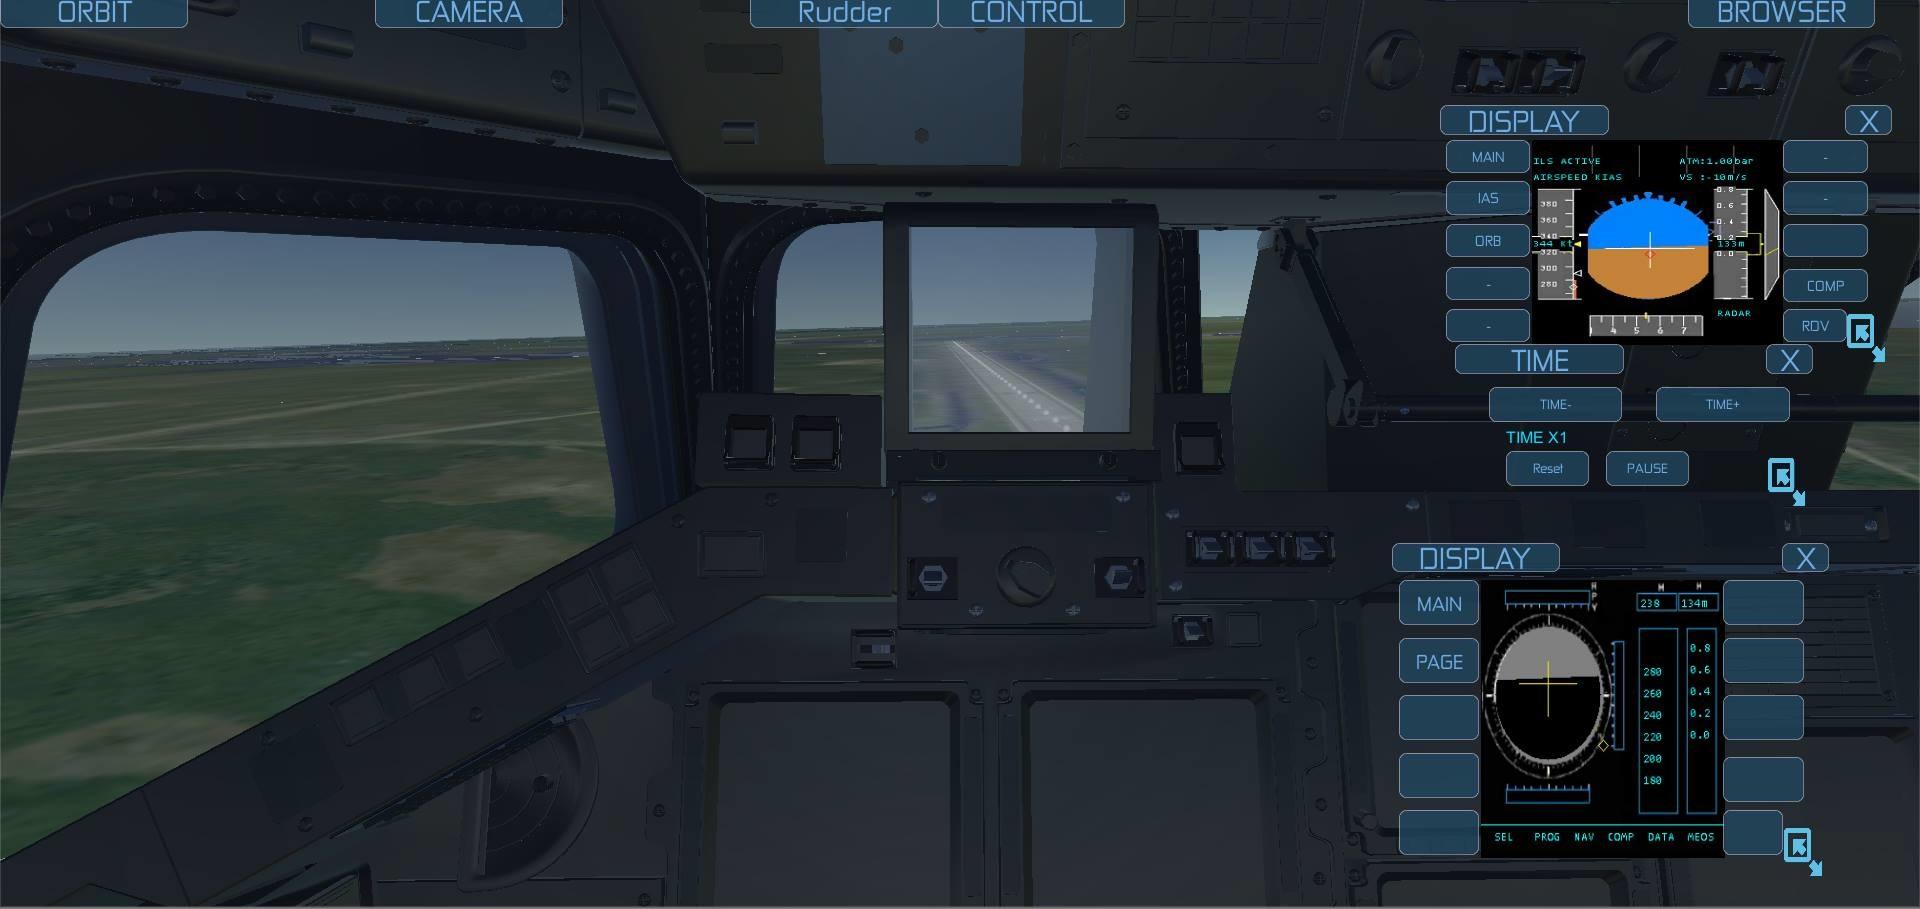 land the space shuttle simulator - photo #47